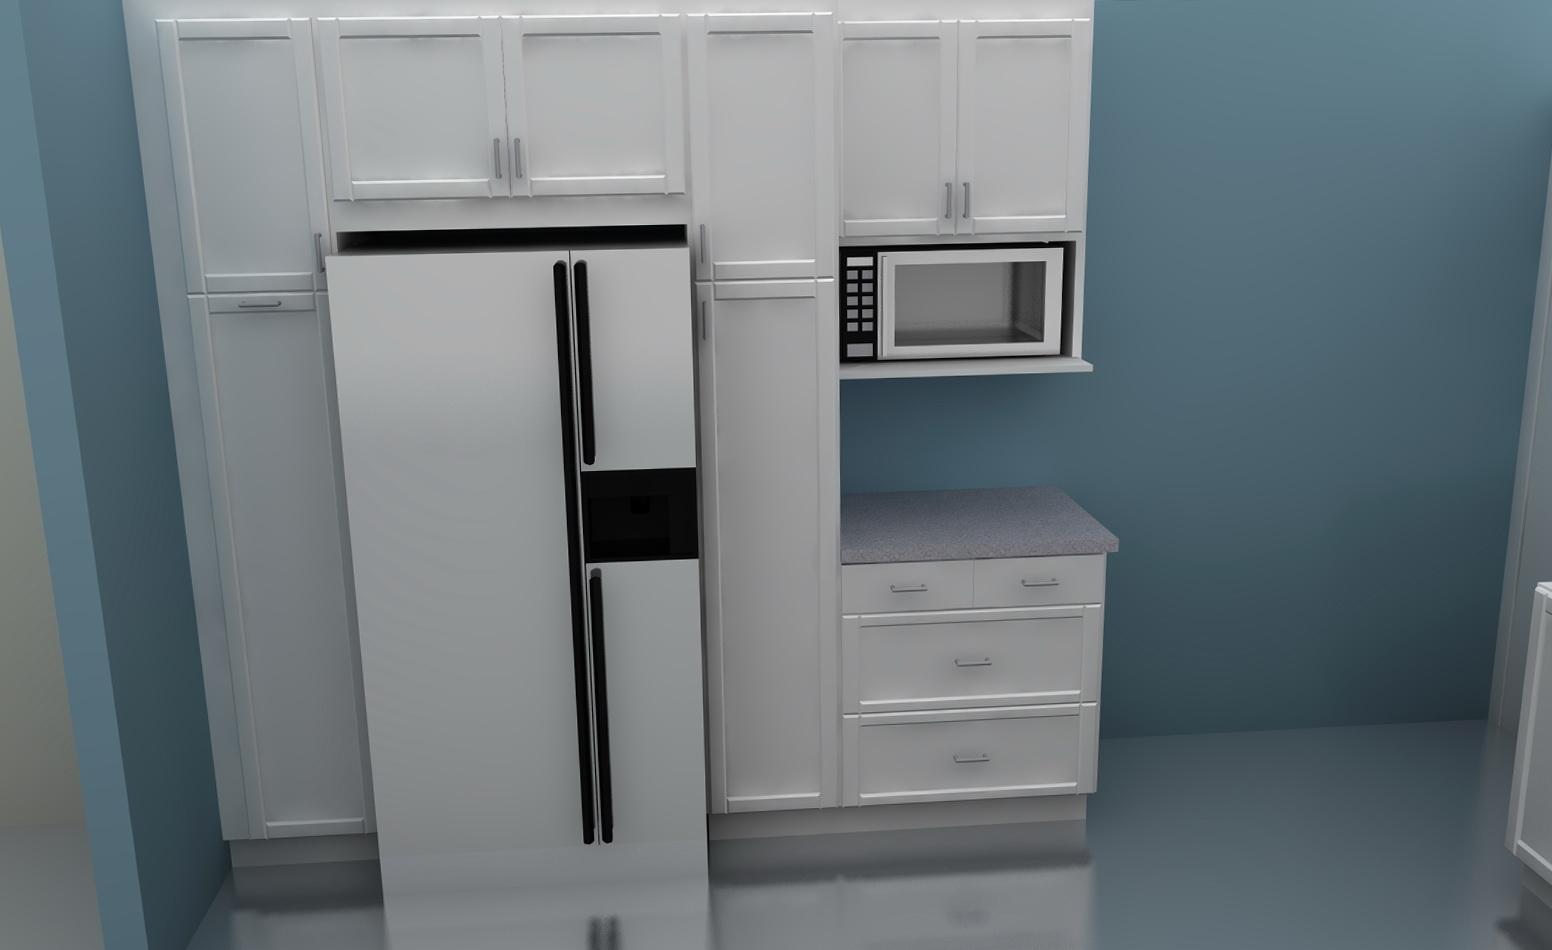 Blind Corner Pantry Cabinet